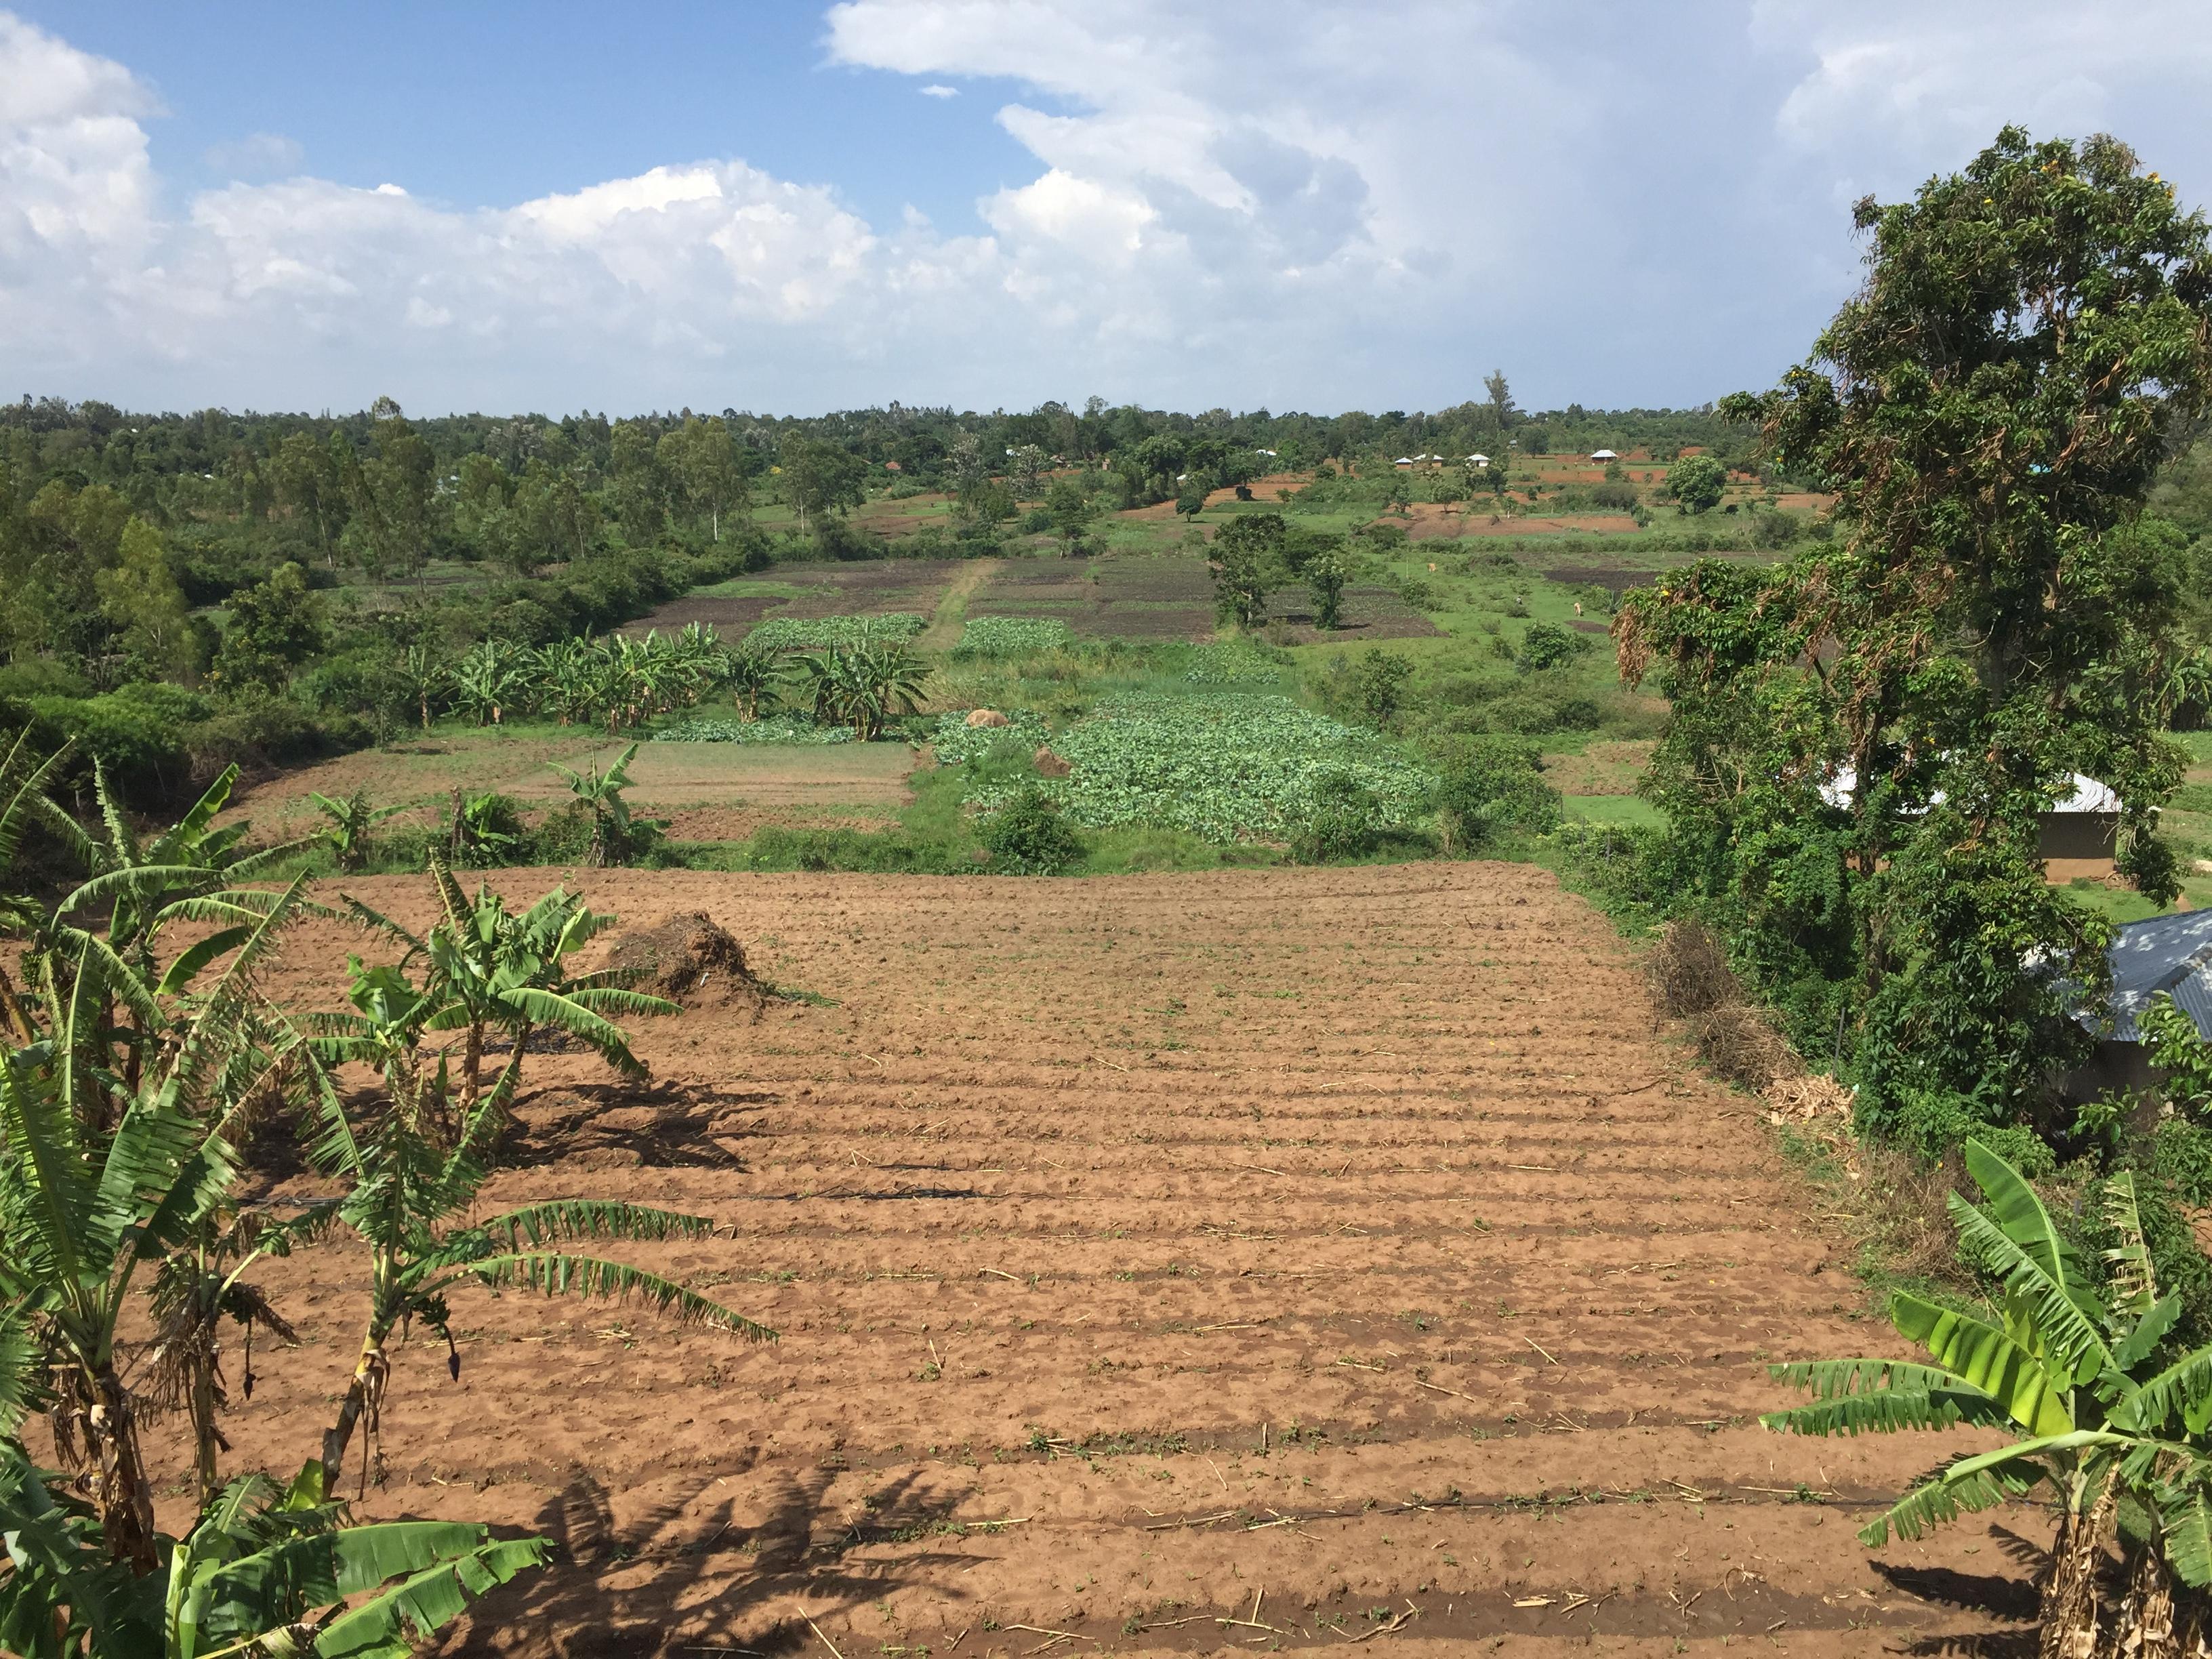 YOGO FARM OVERHEAD